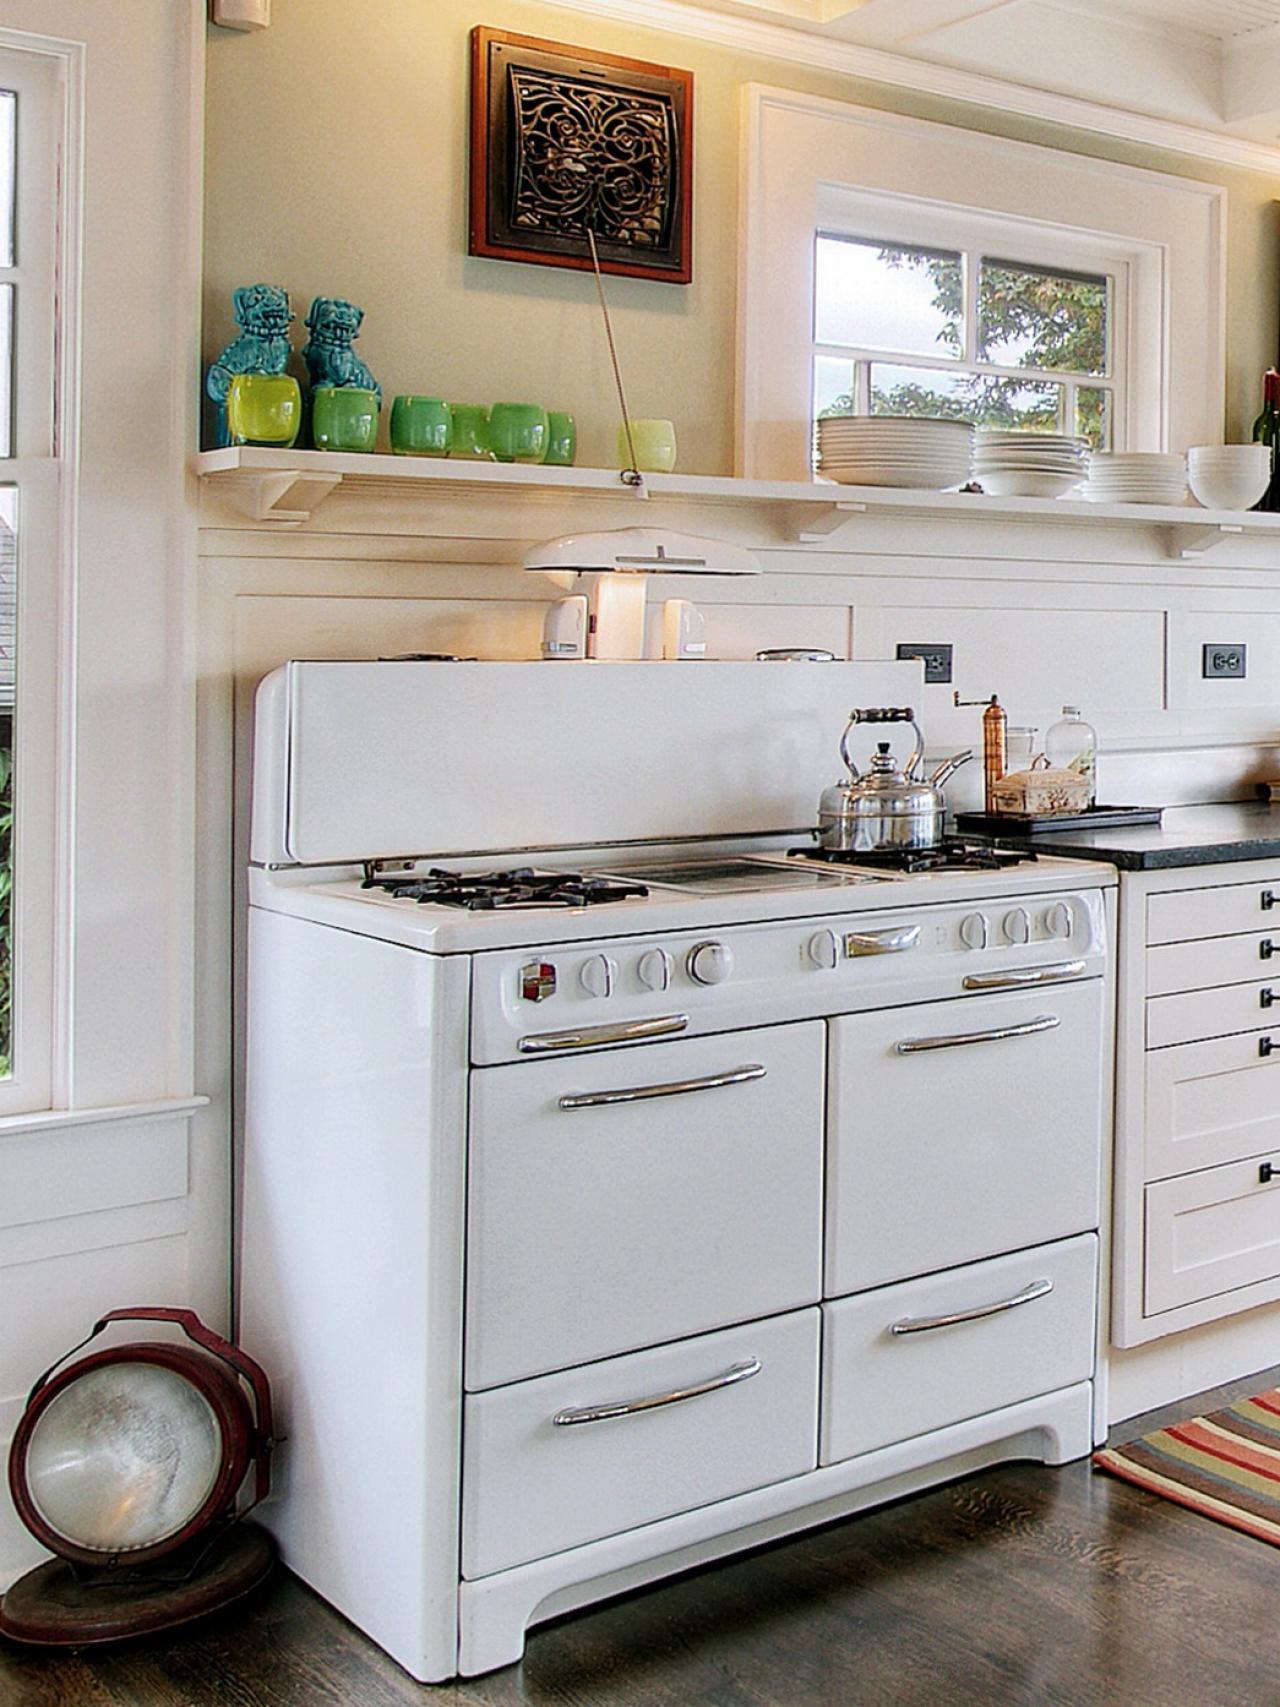 Older Home Kitchen Remodeling Ideas White Kitchen Themes | Raysa House